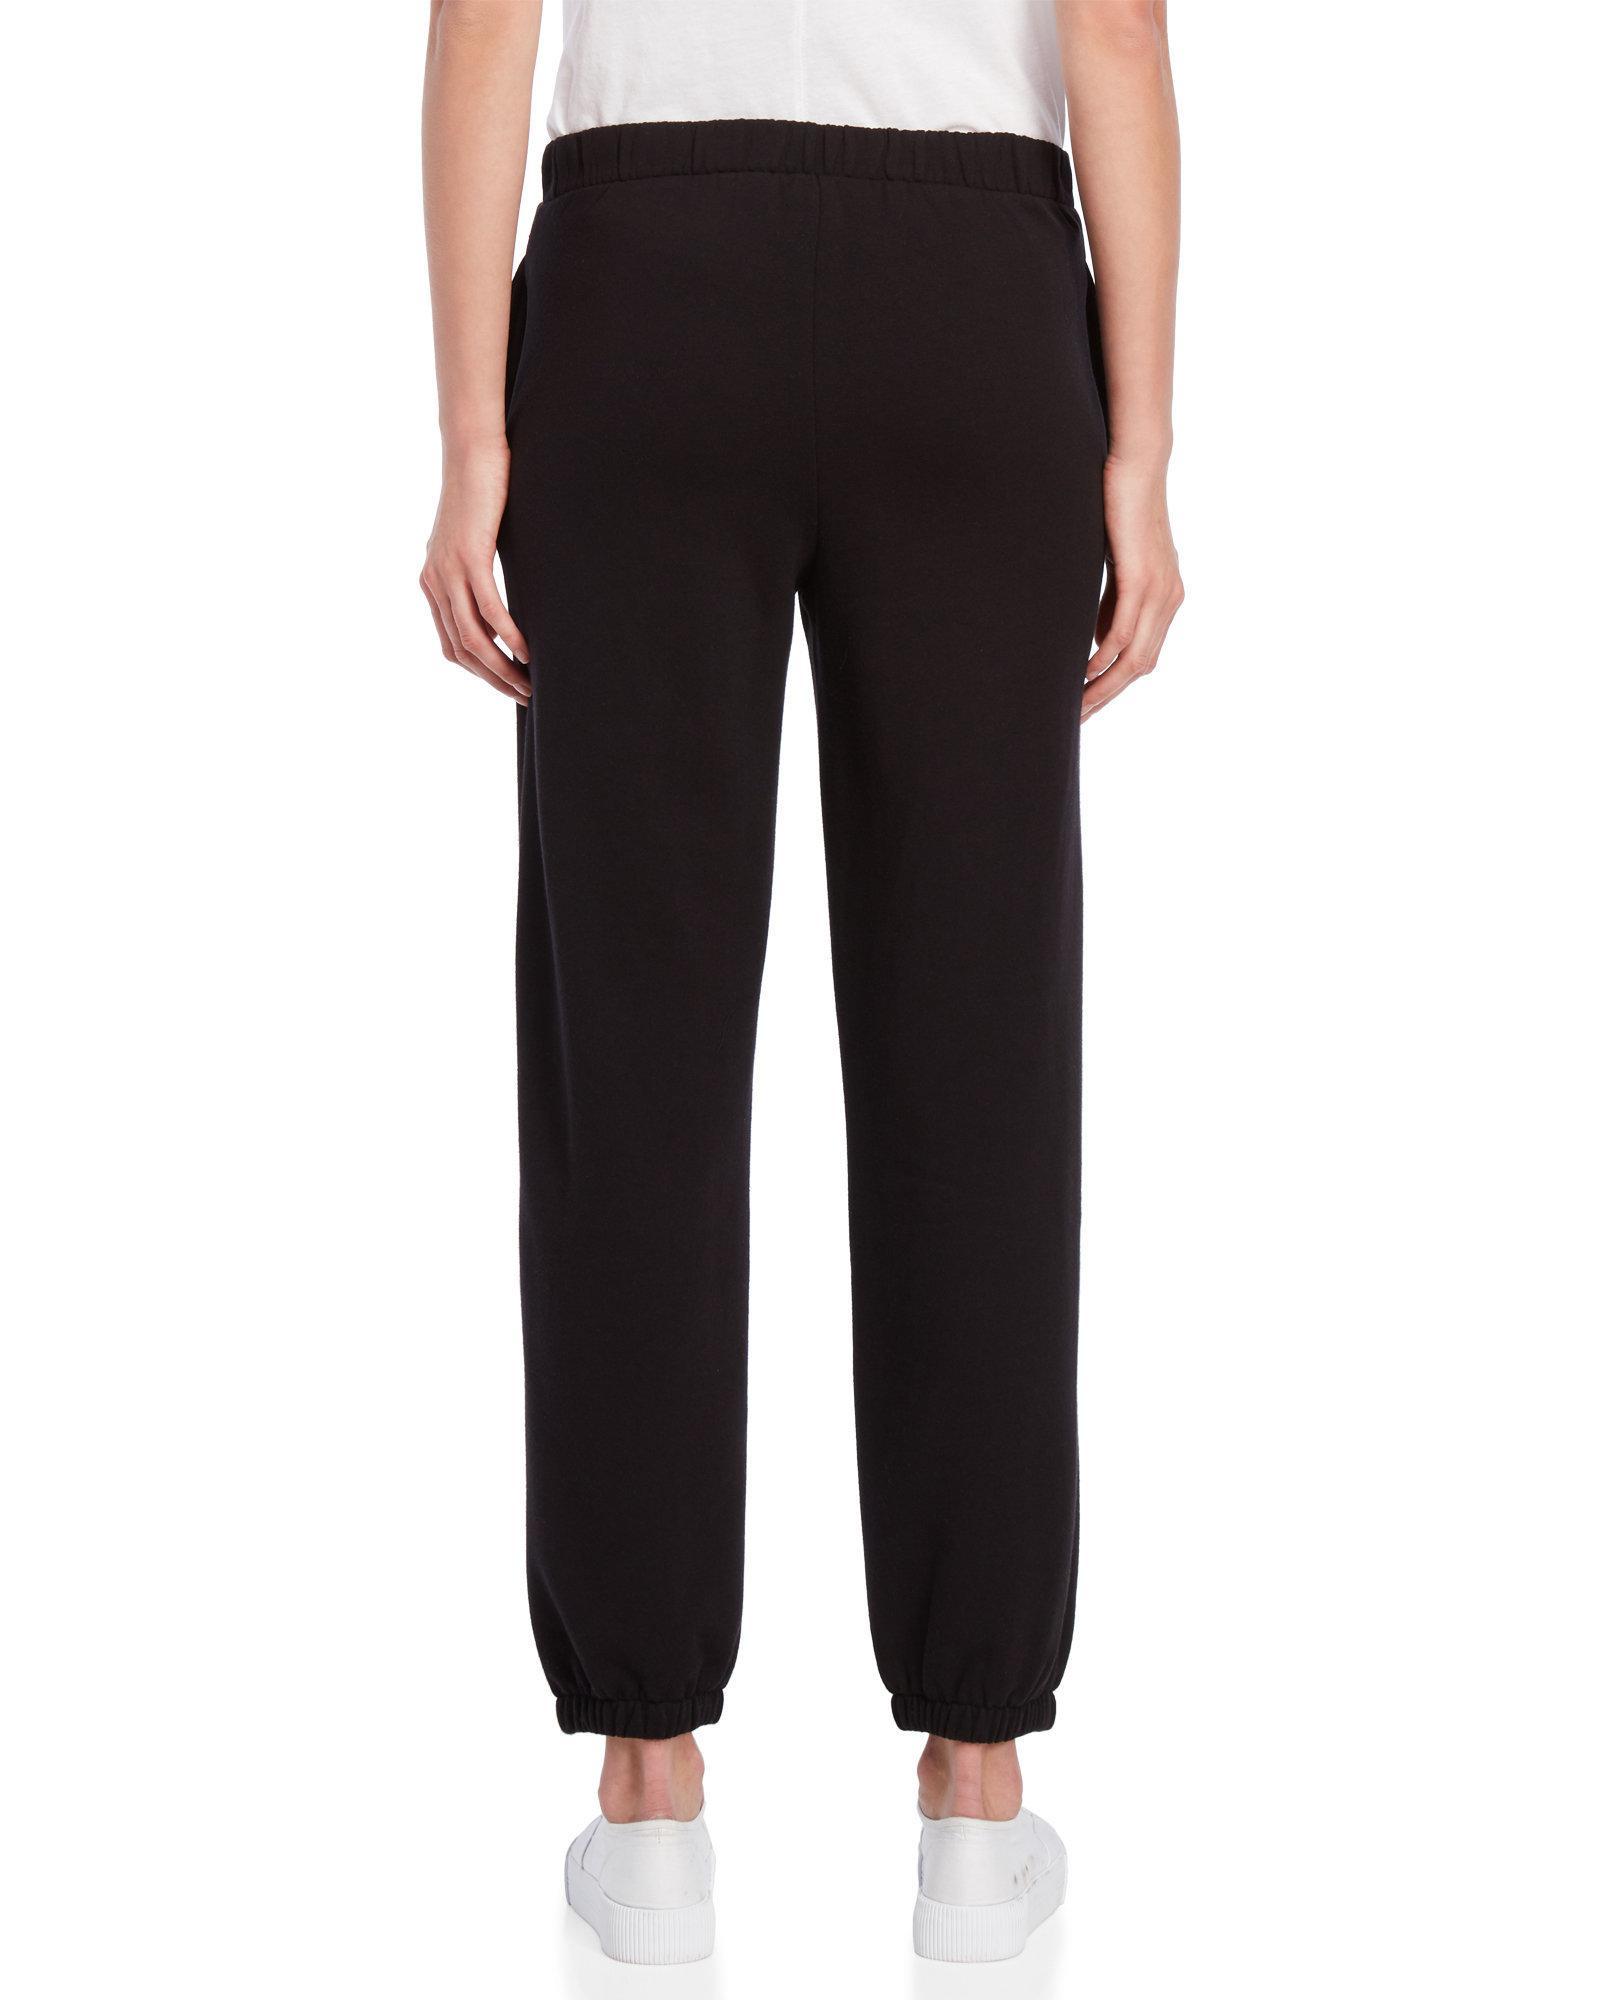 677bcd526f Lyst - Juicy Couture Emblem Logo Fleece Sweatpants in Black